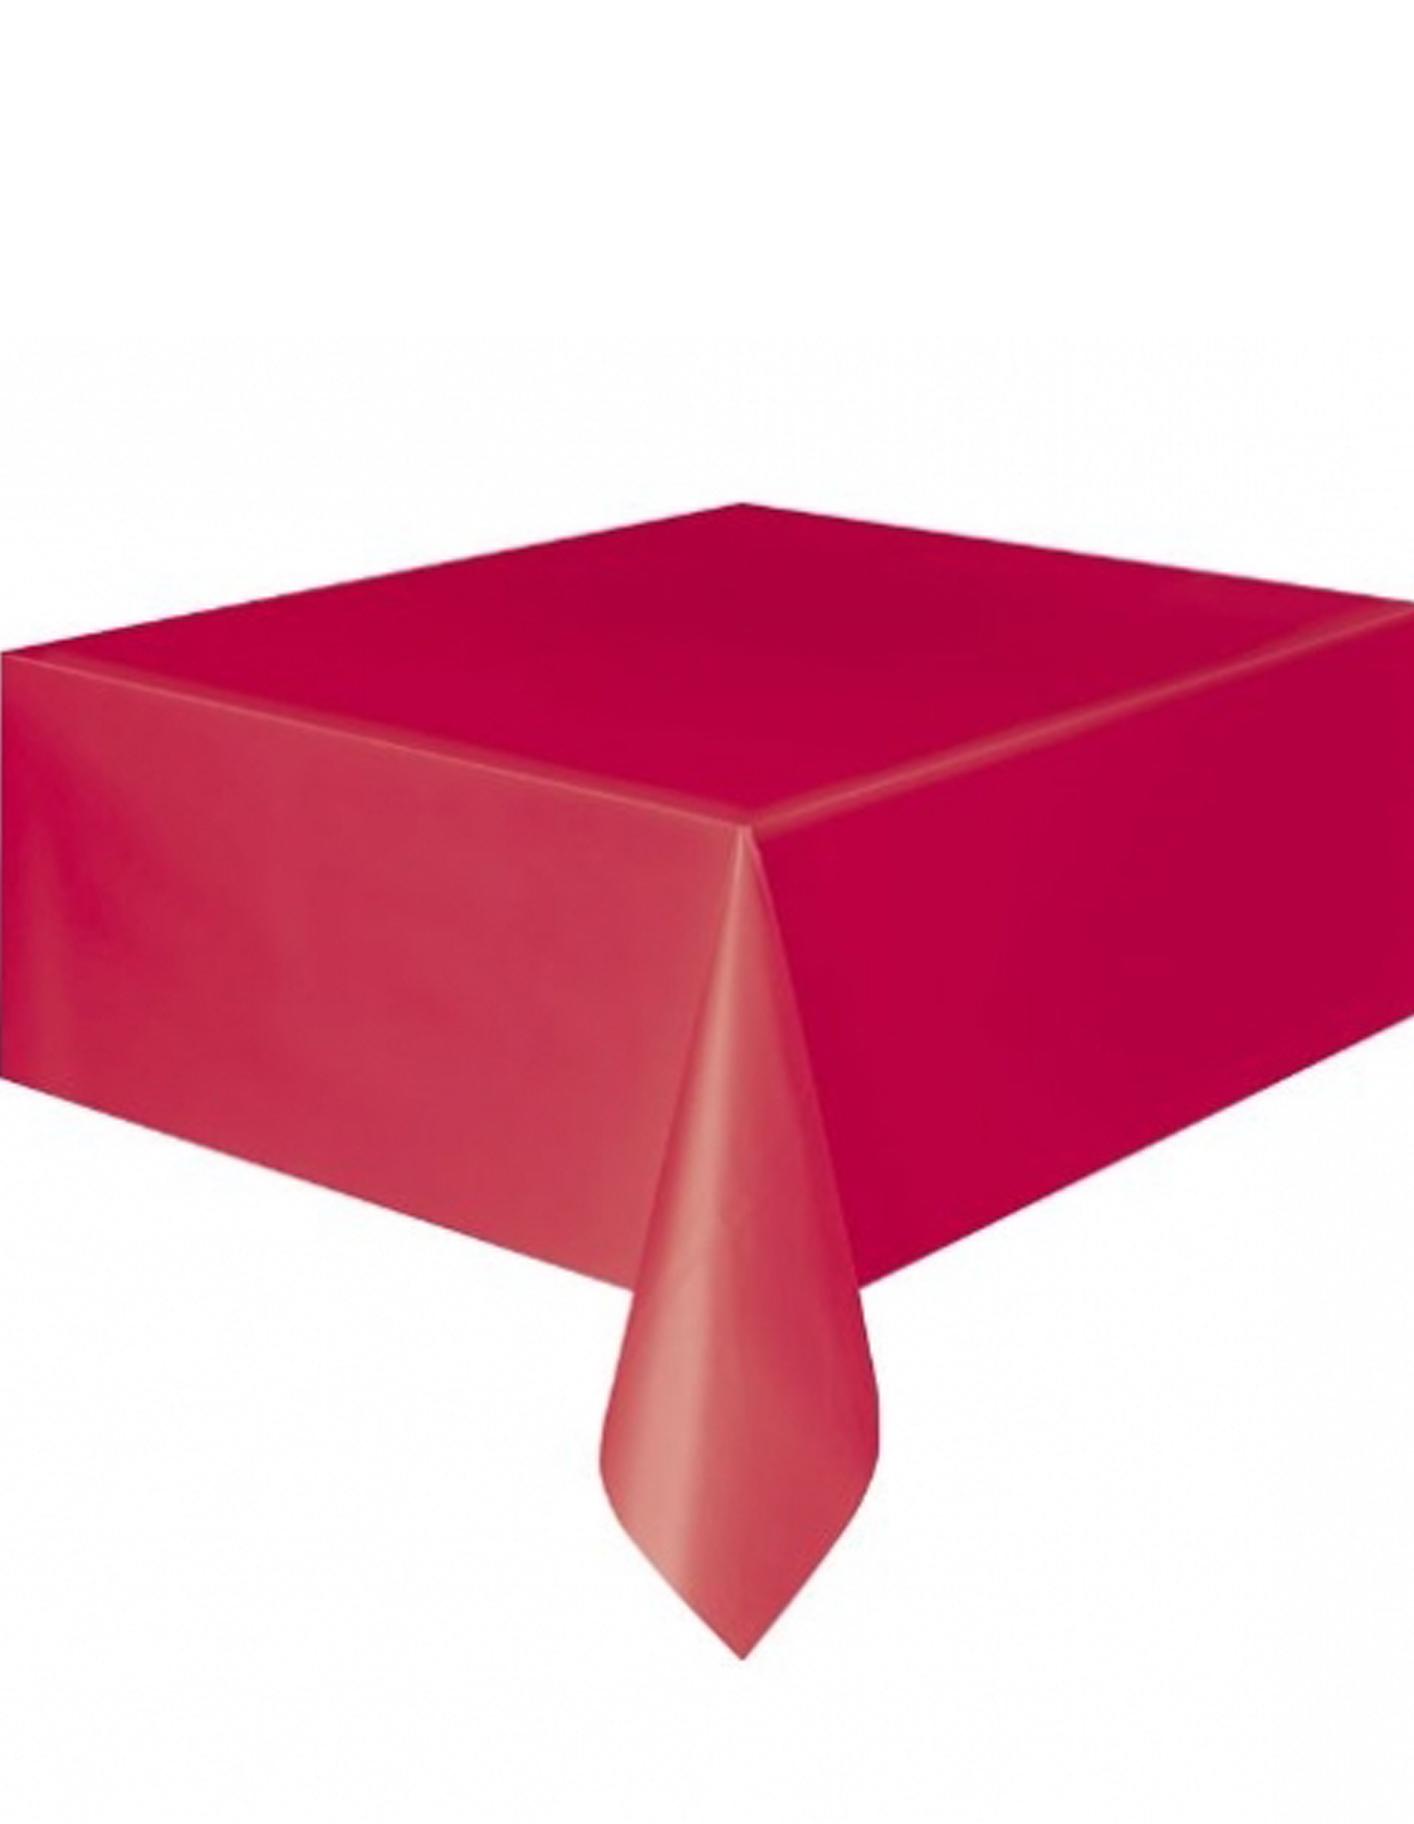 Manteles De Plastico 9ddf Mantel Plà Stico Rojo 137x274cm